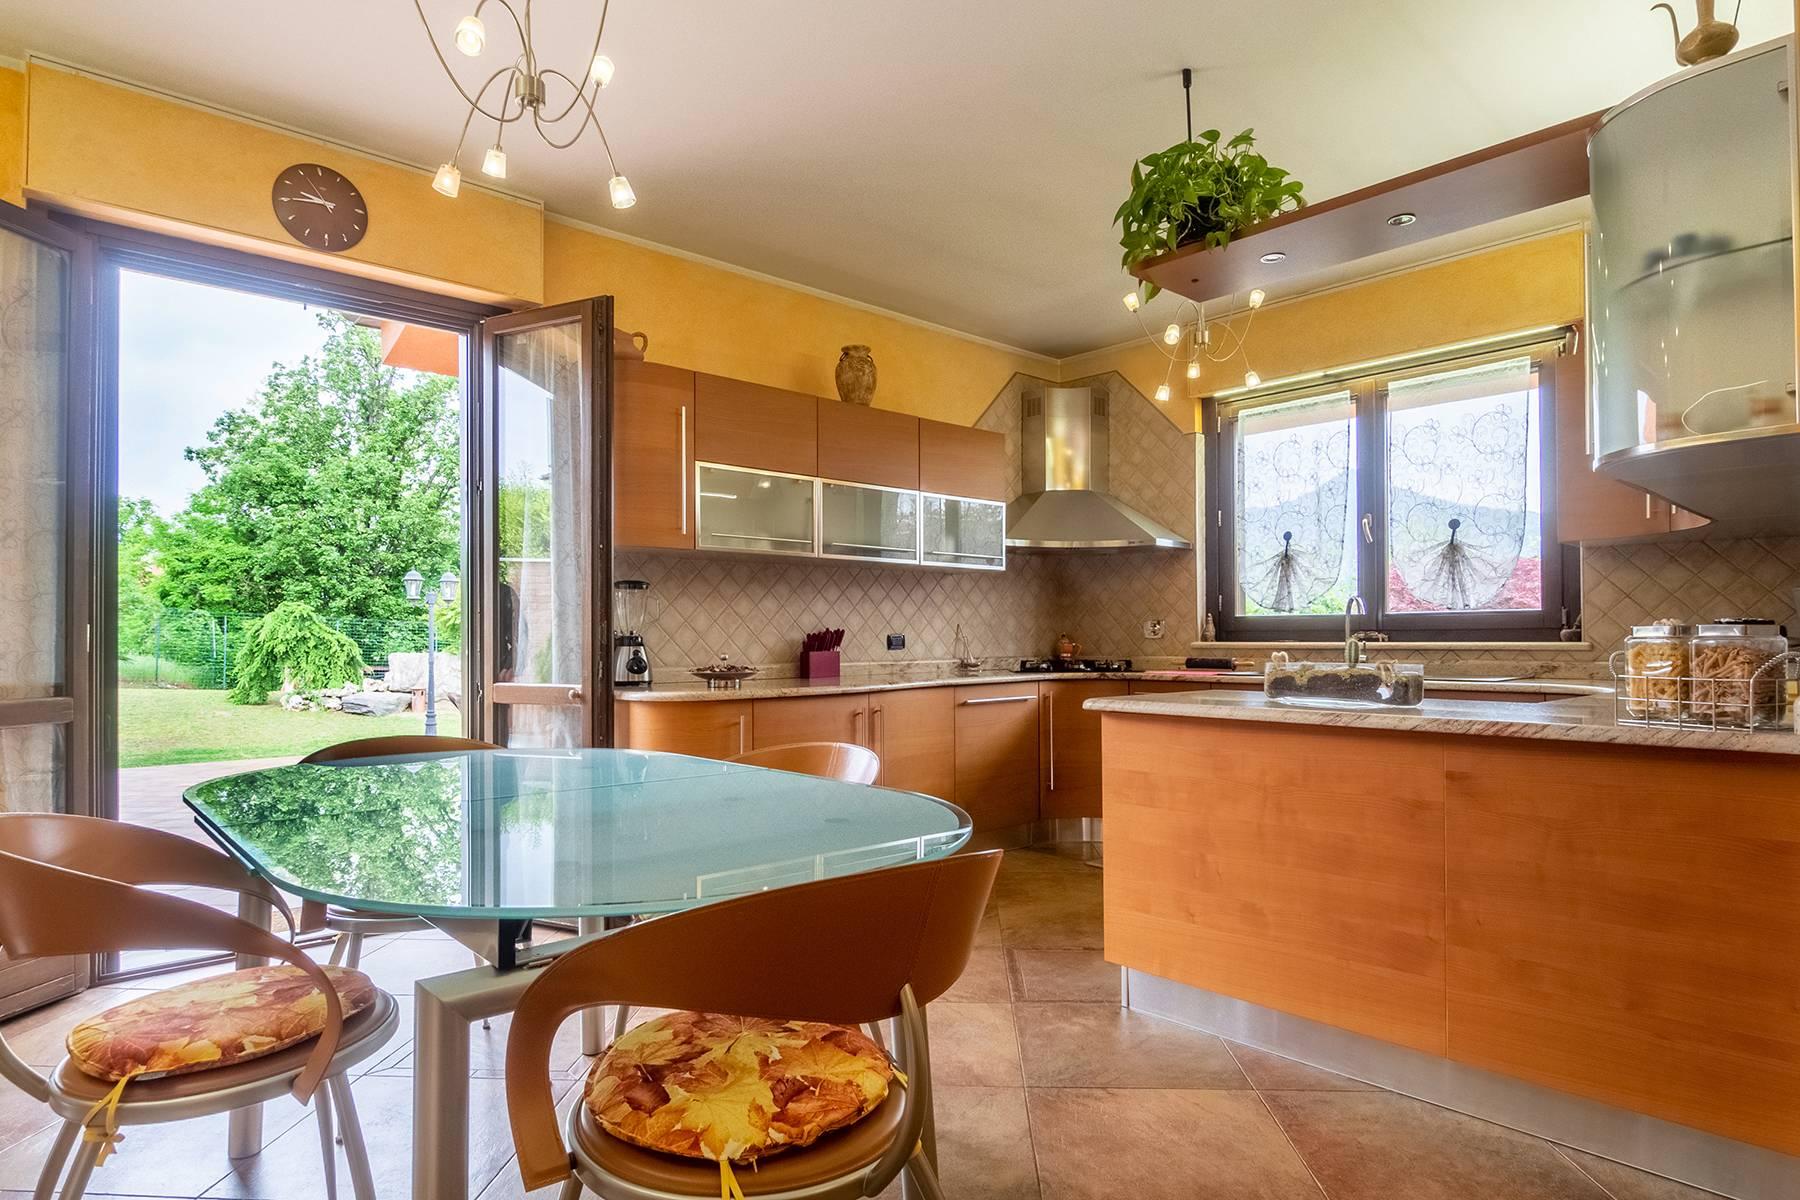 Villa in Vendita a Rosta: 5 locali, 182 mq - Foto 12